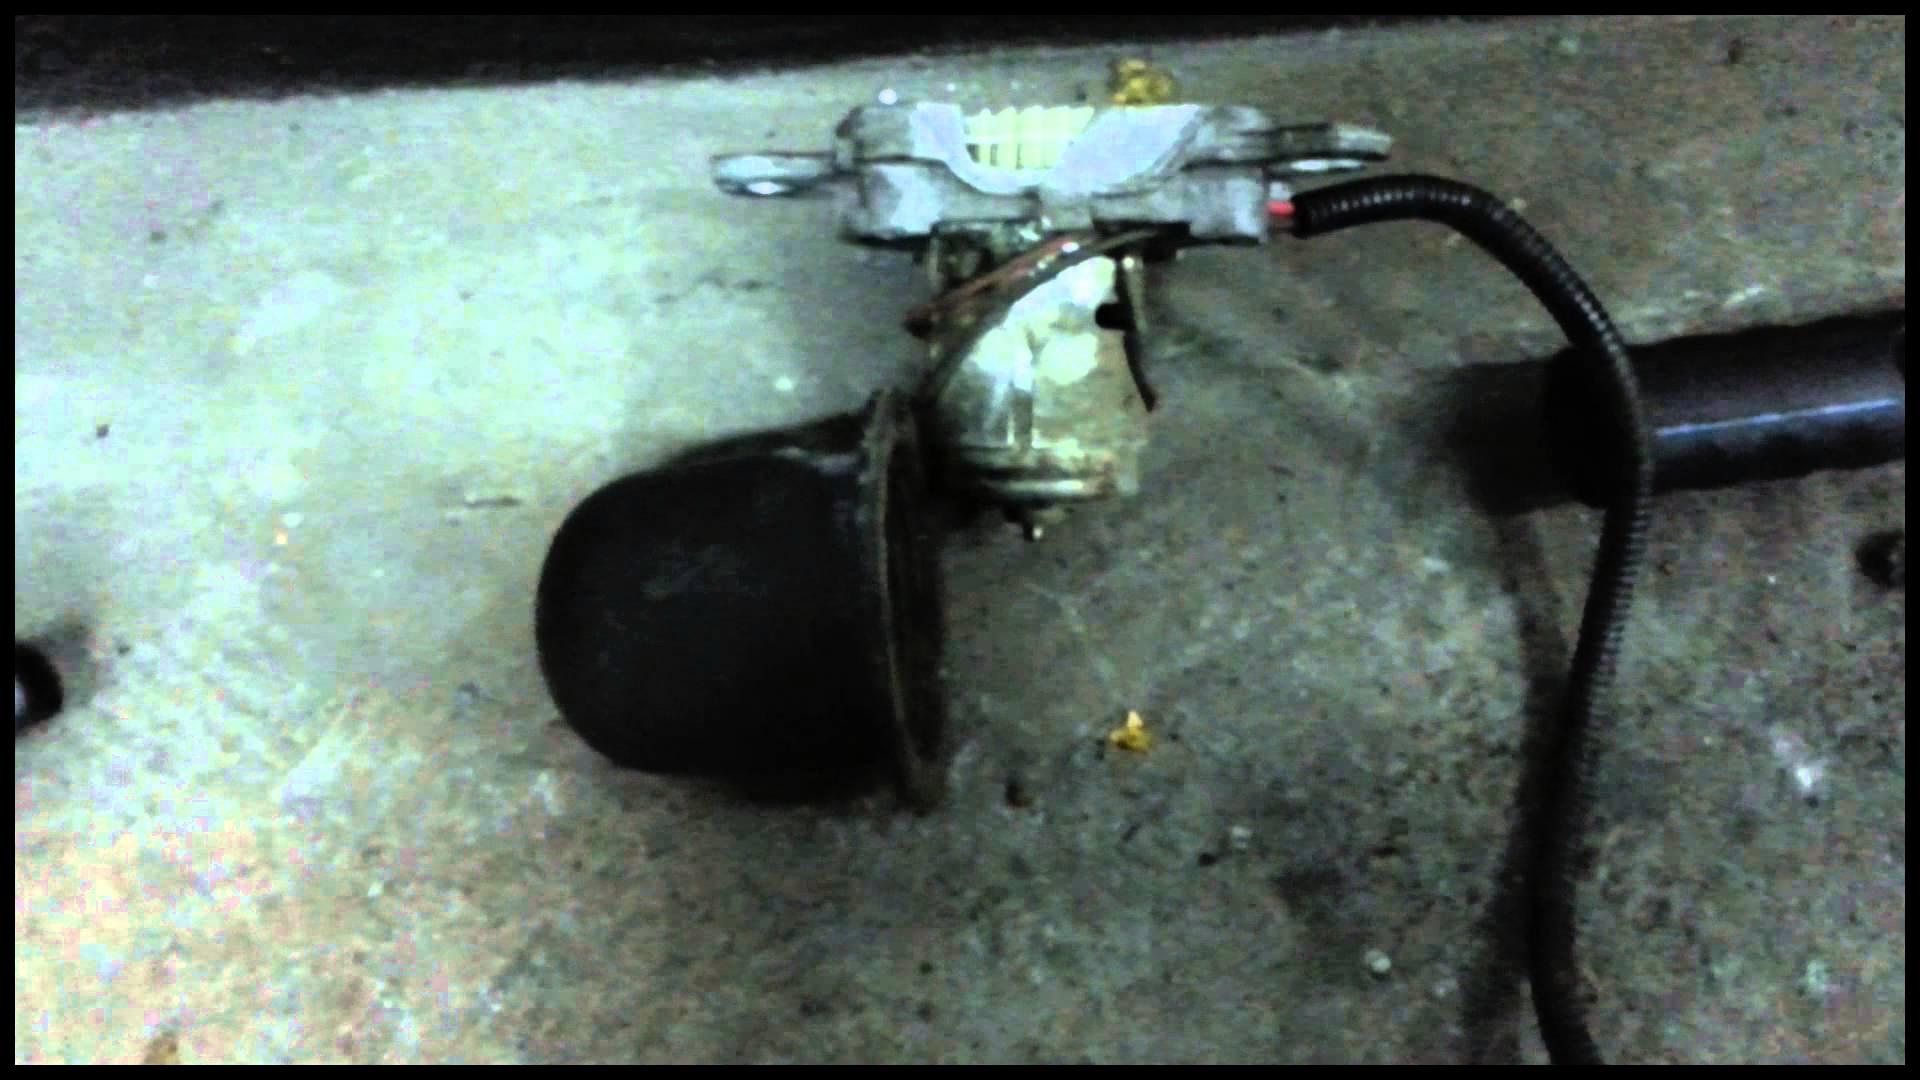 Toyota Tundra P2445 code sec air pump stuck off